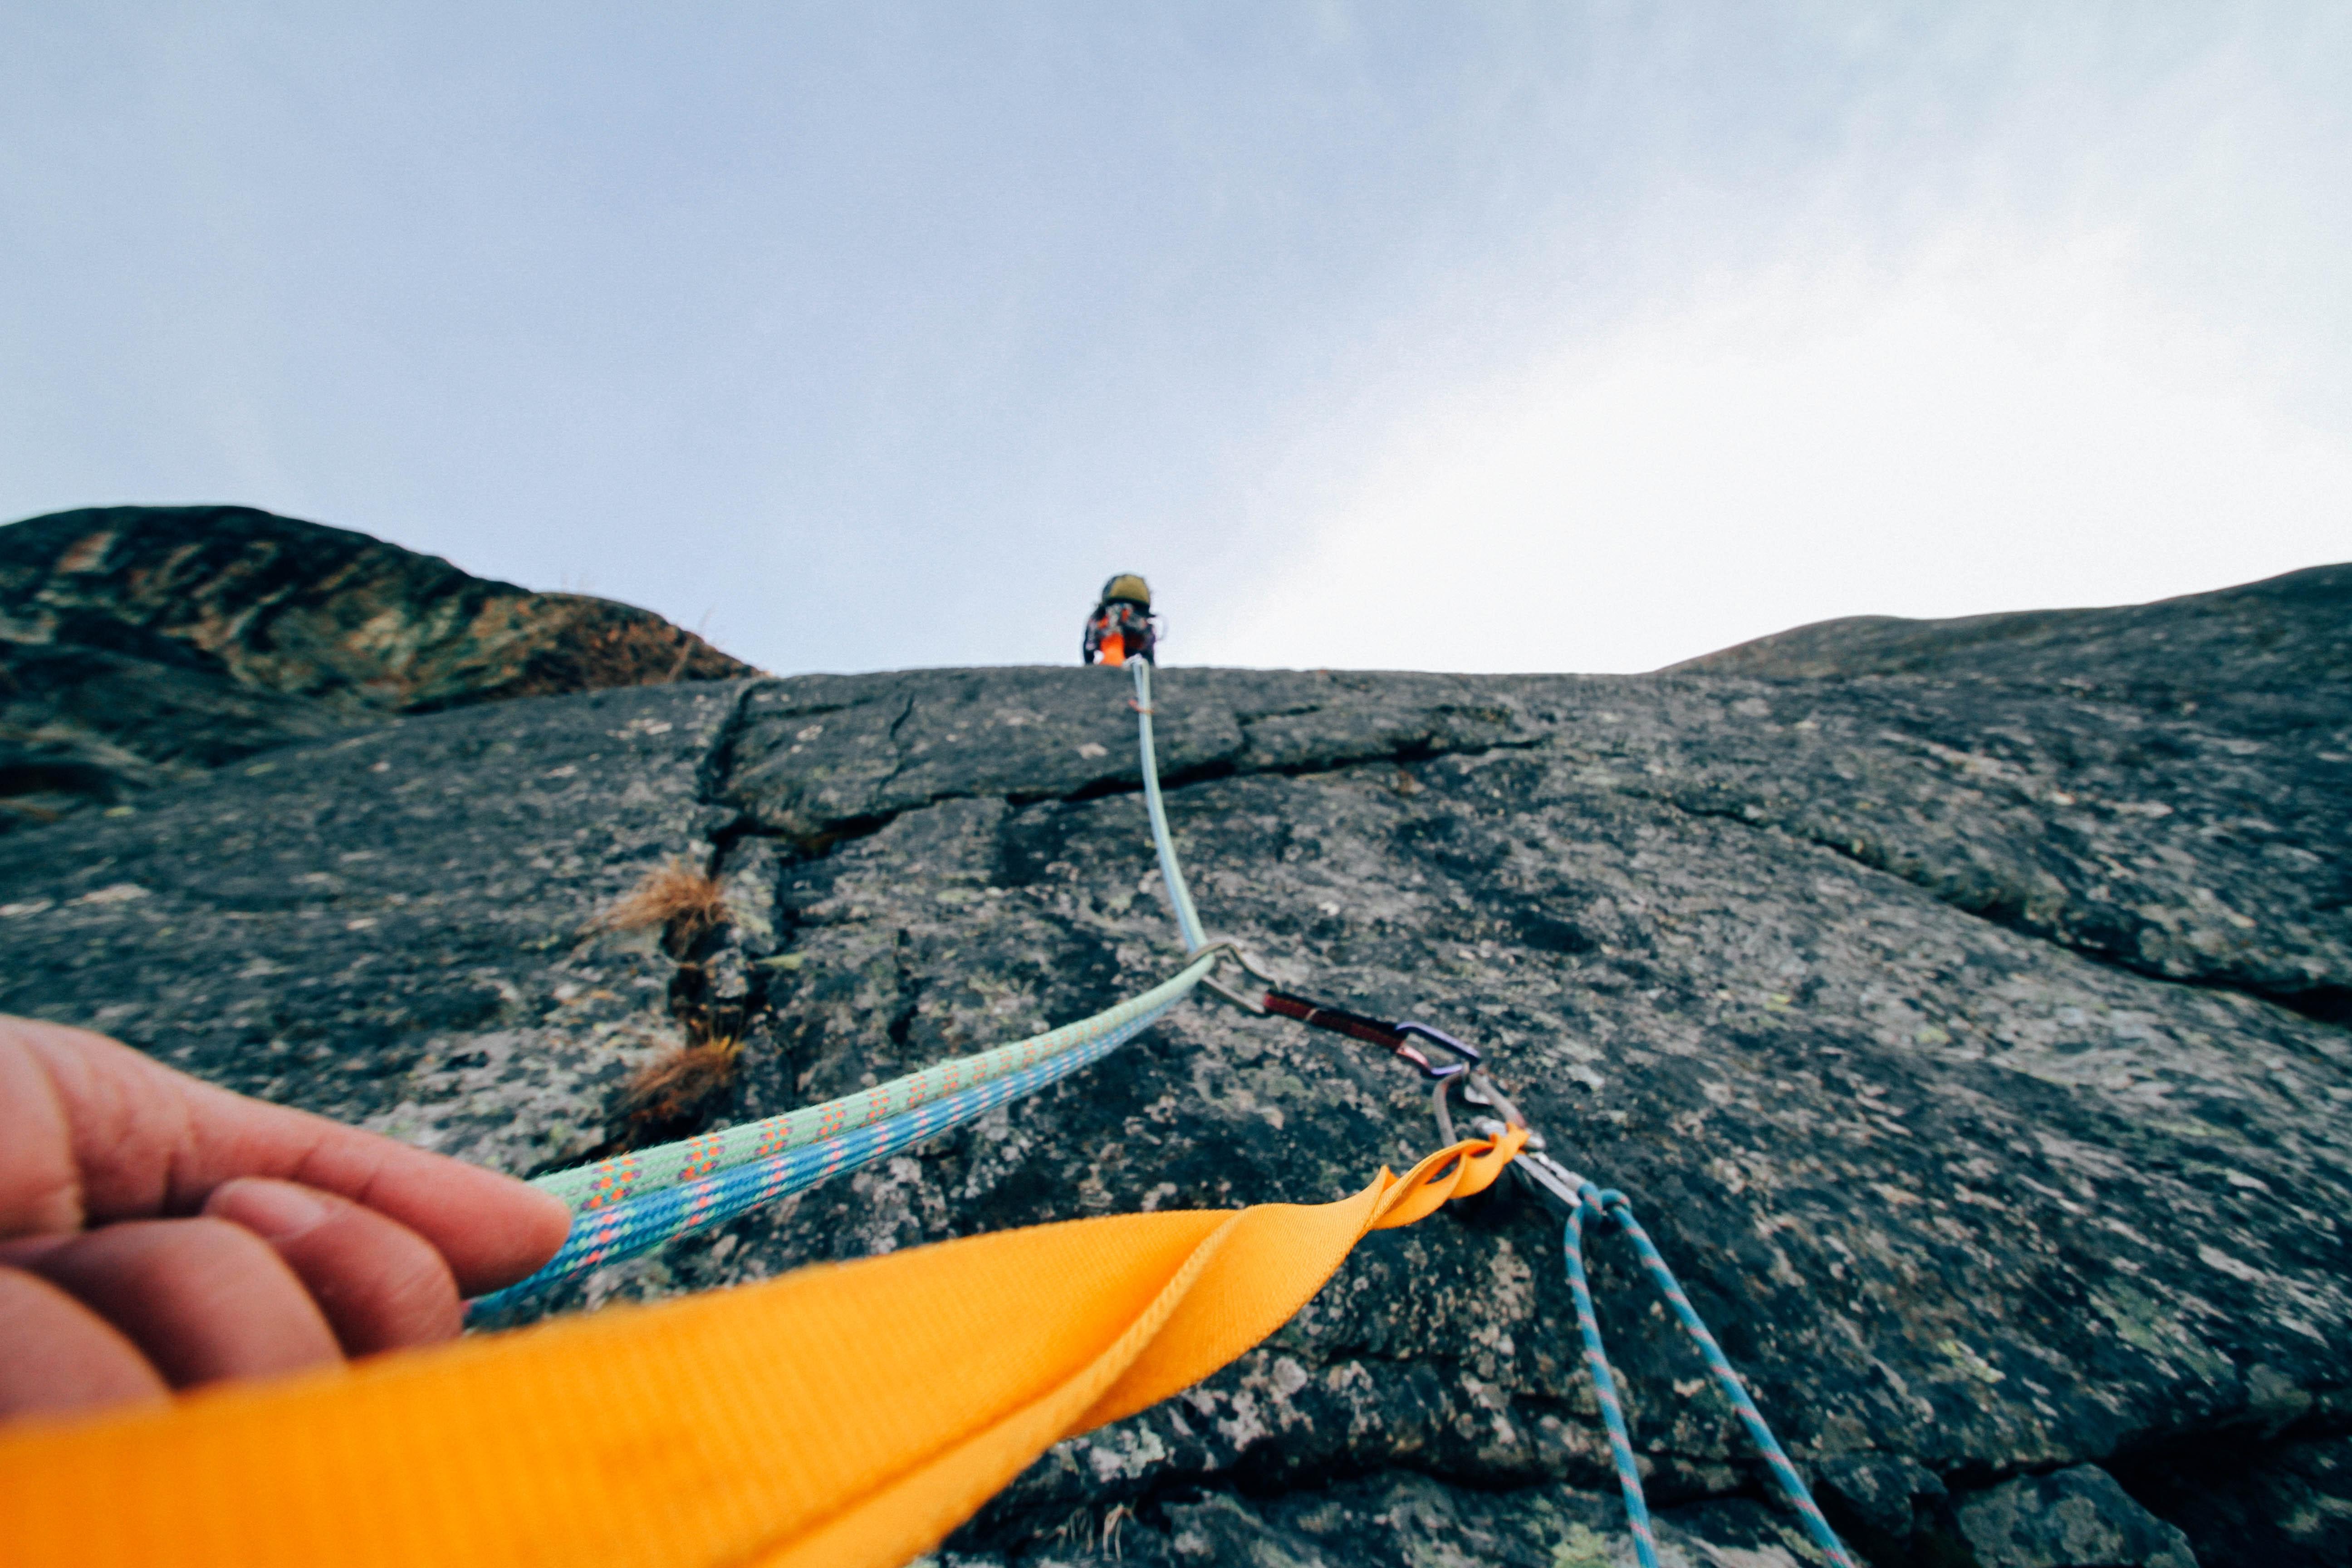 action-adventure-climbing-303040 (1)